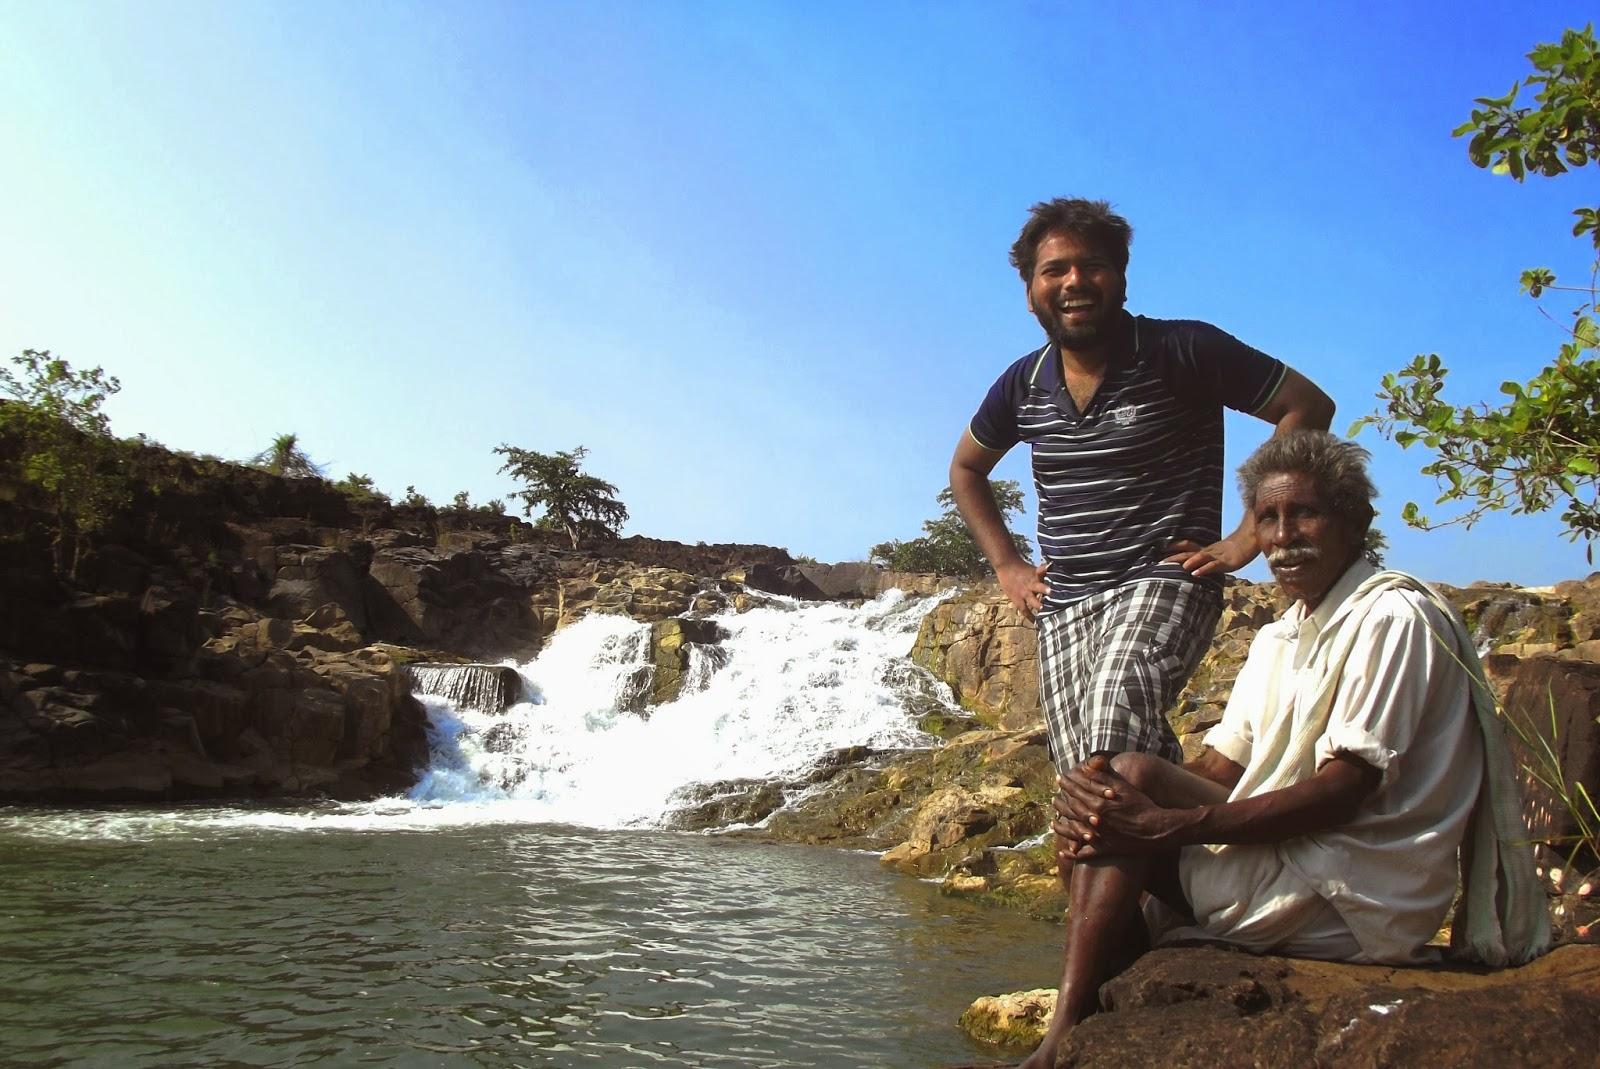 Arif with Rajanna @ Kanakai Waterfalls